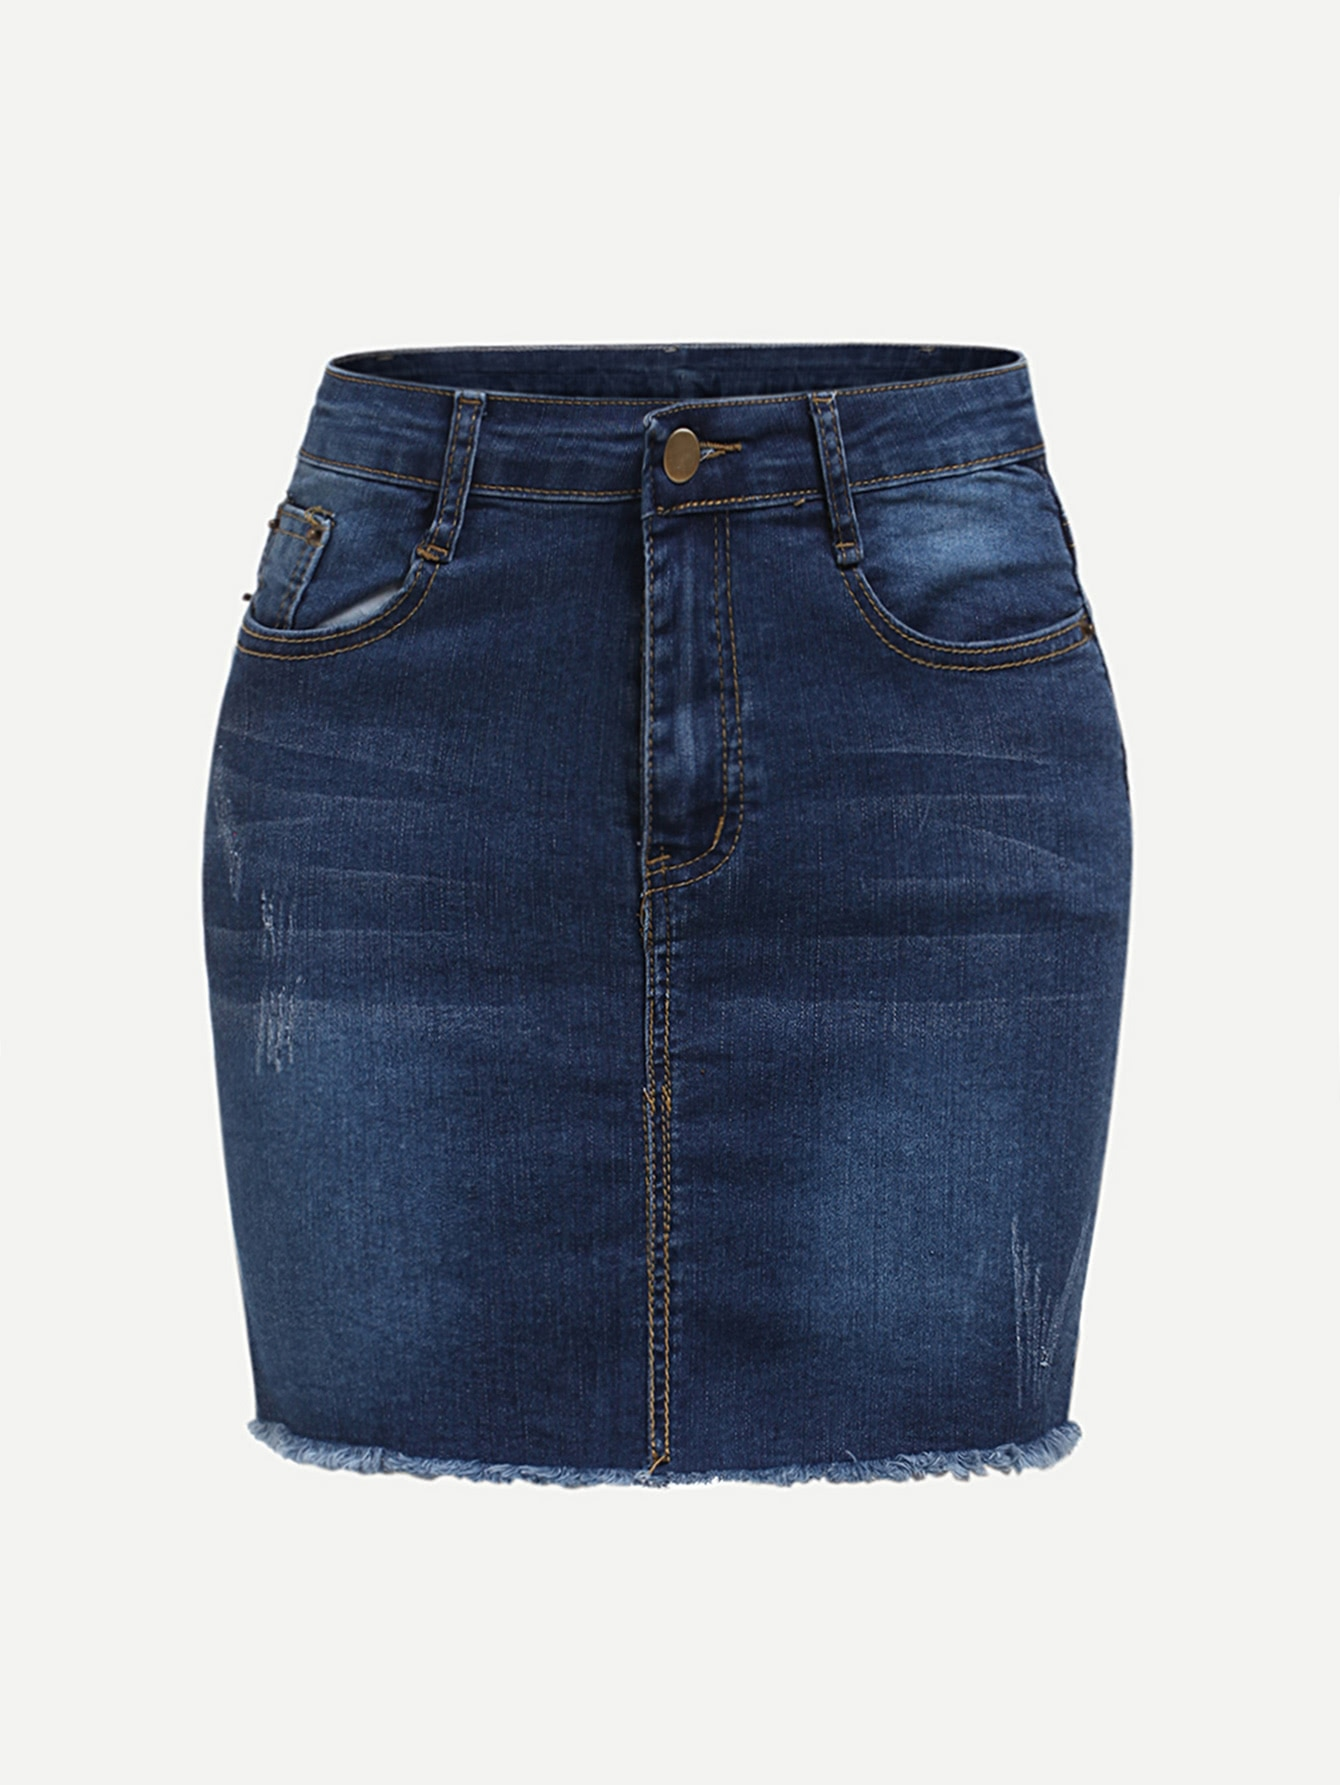 Raw Hem Denim Skirt girls single breasted raw hem skirt